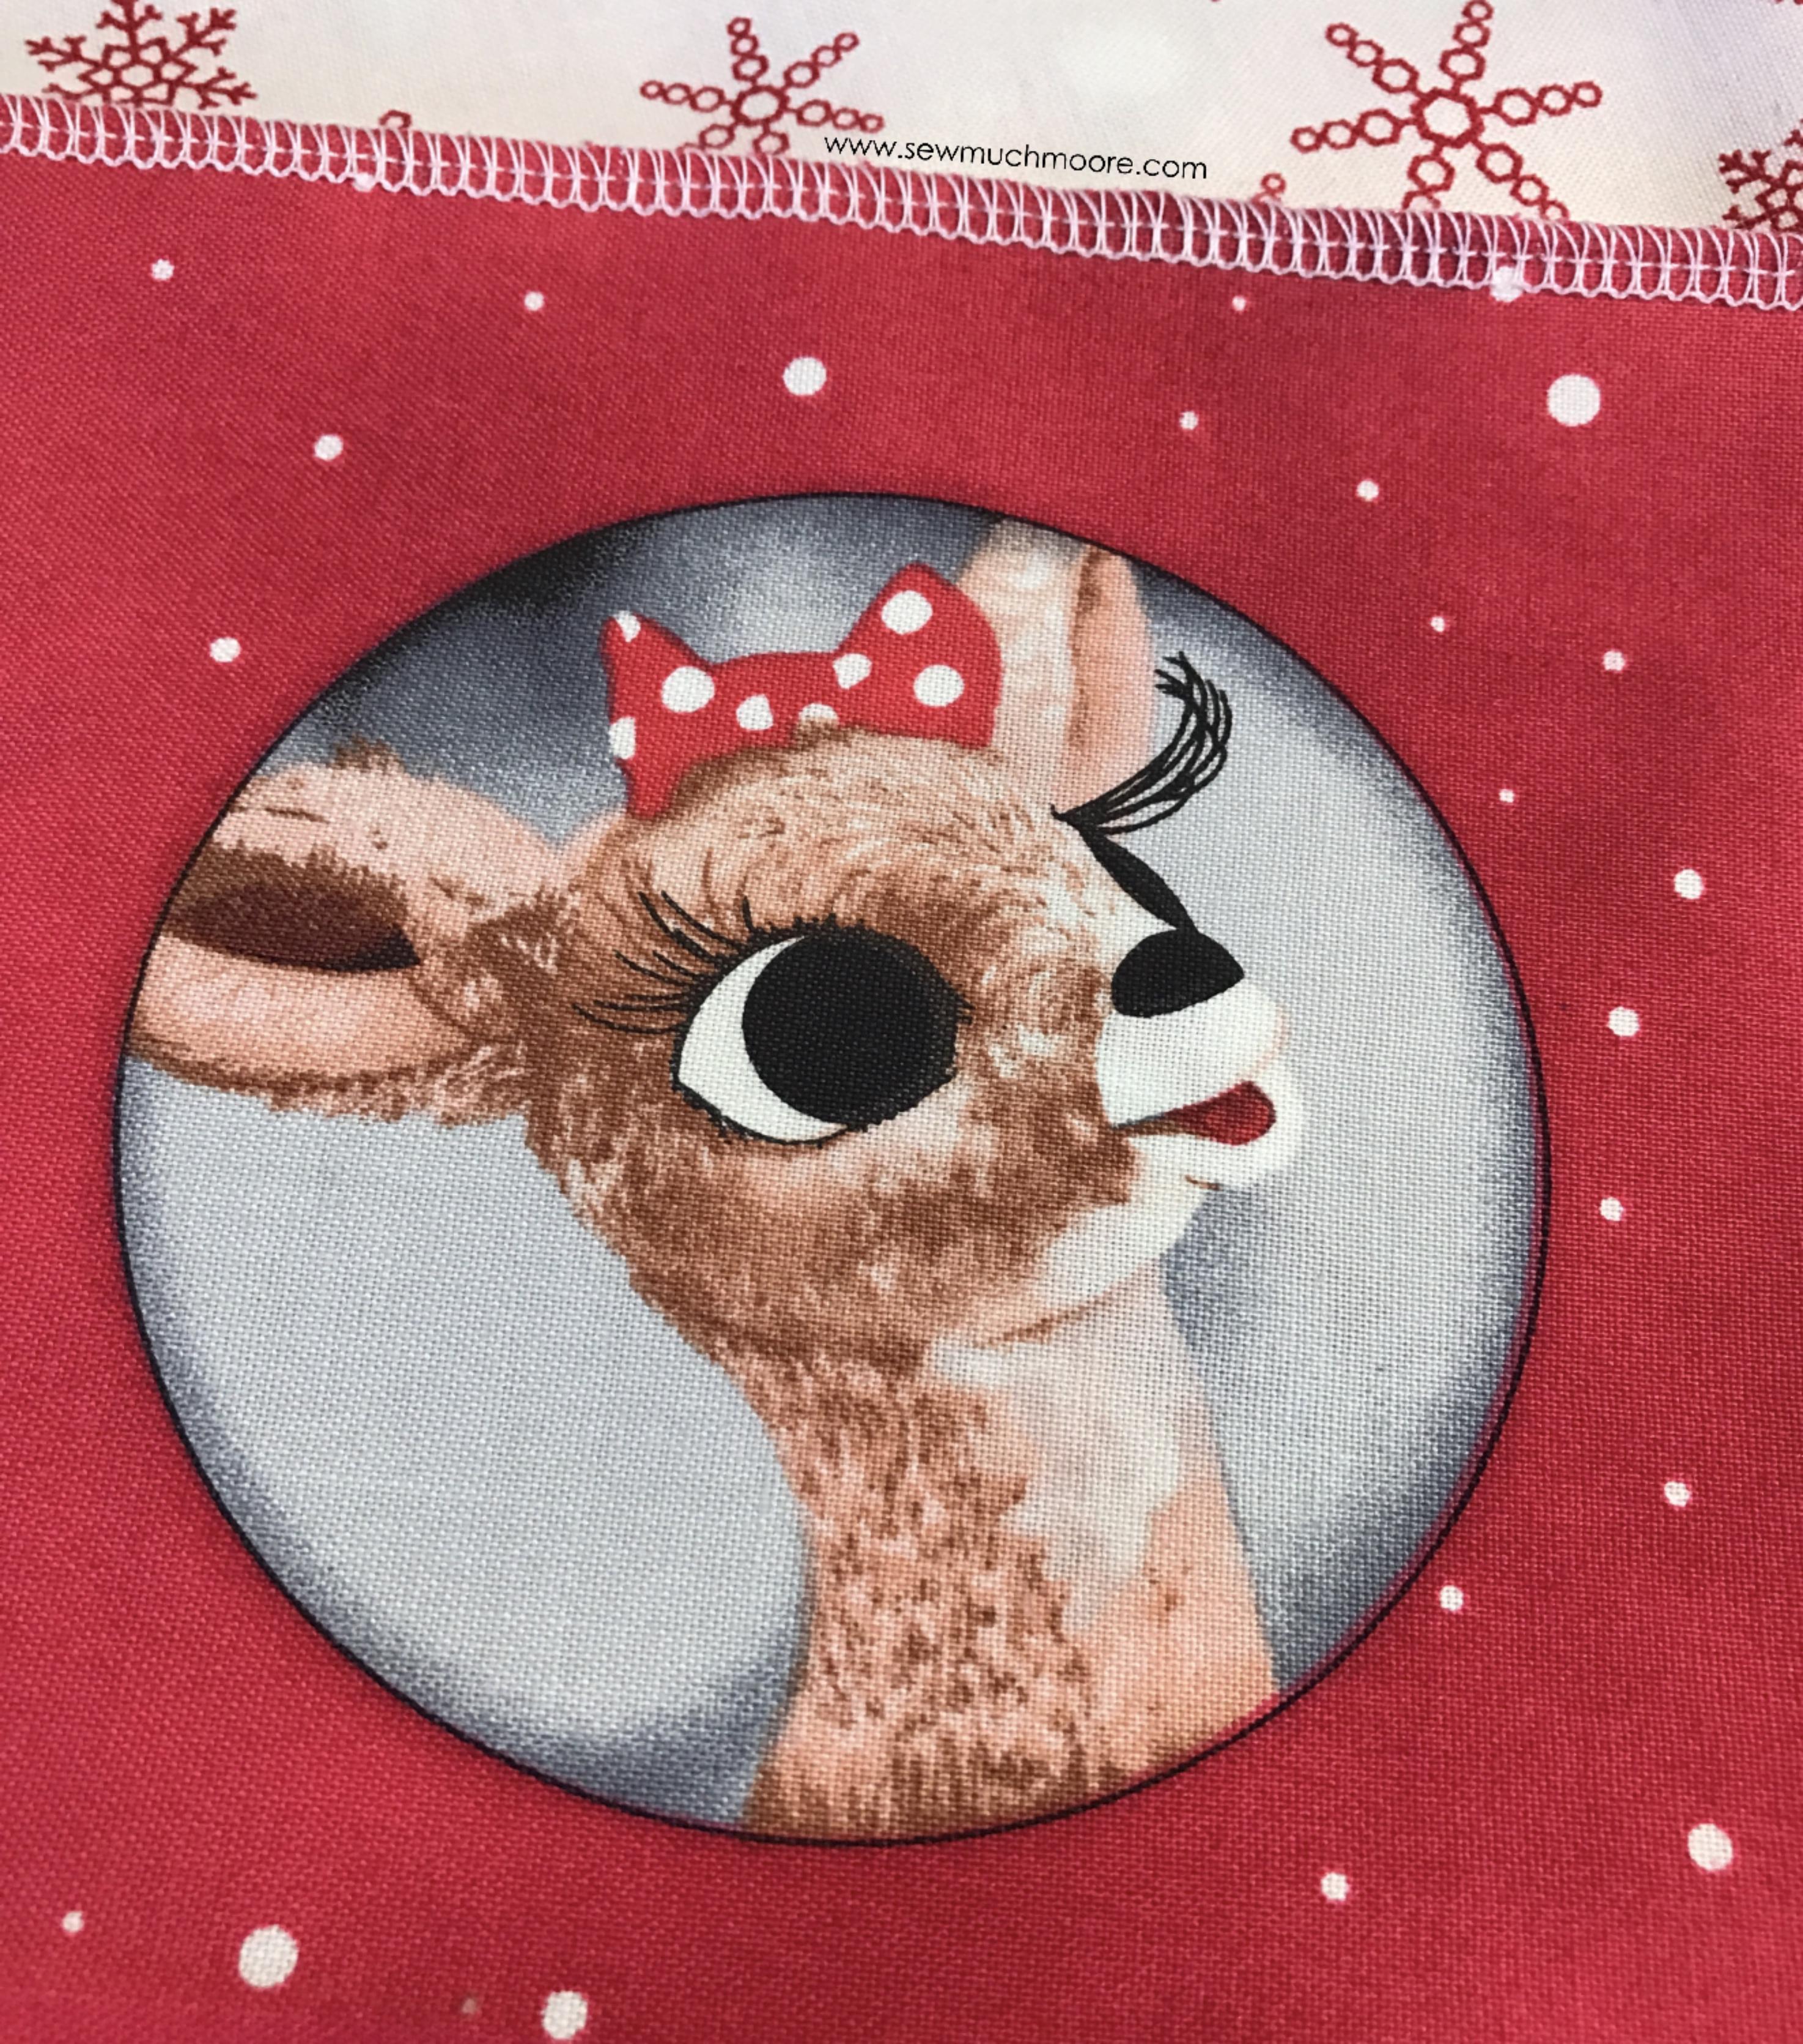 2nd-day-of-christmas-fabric-closeup-1